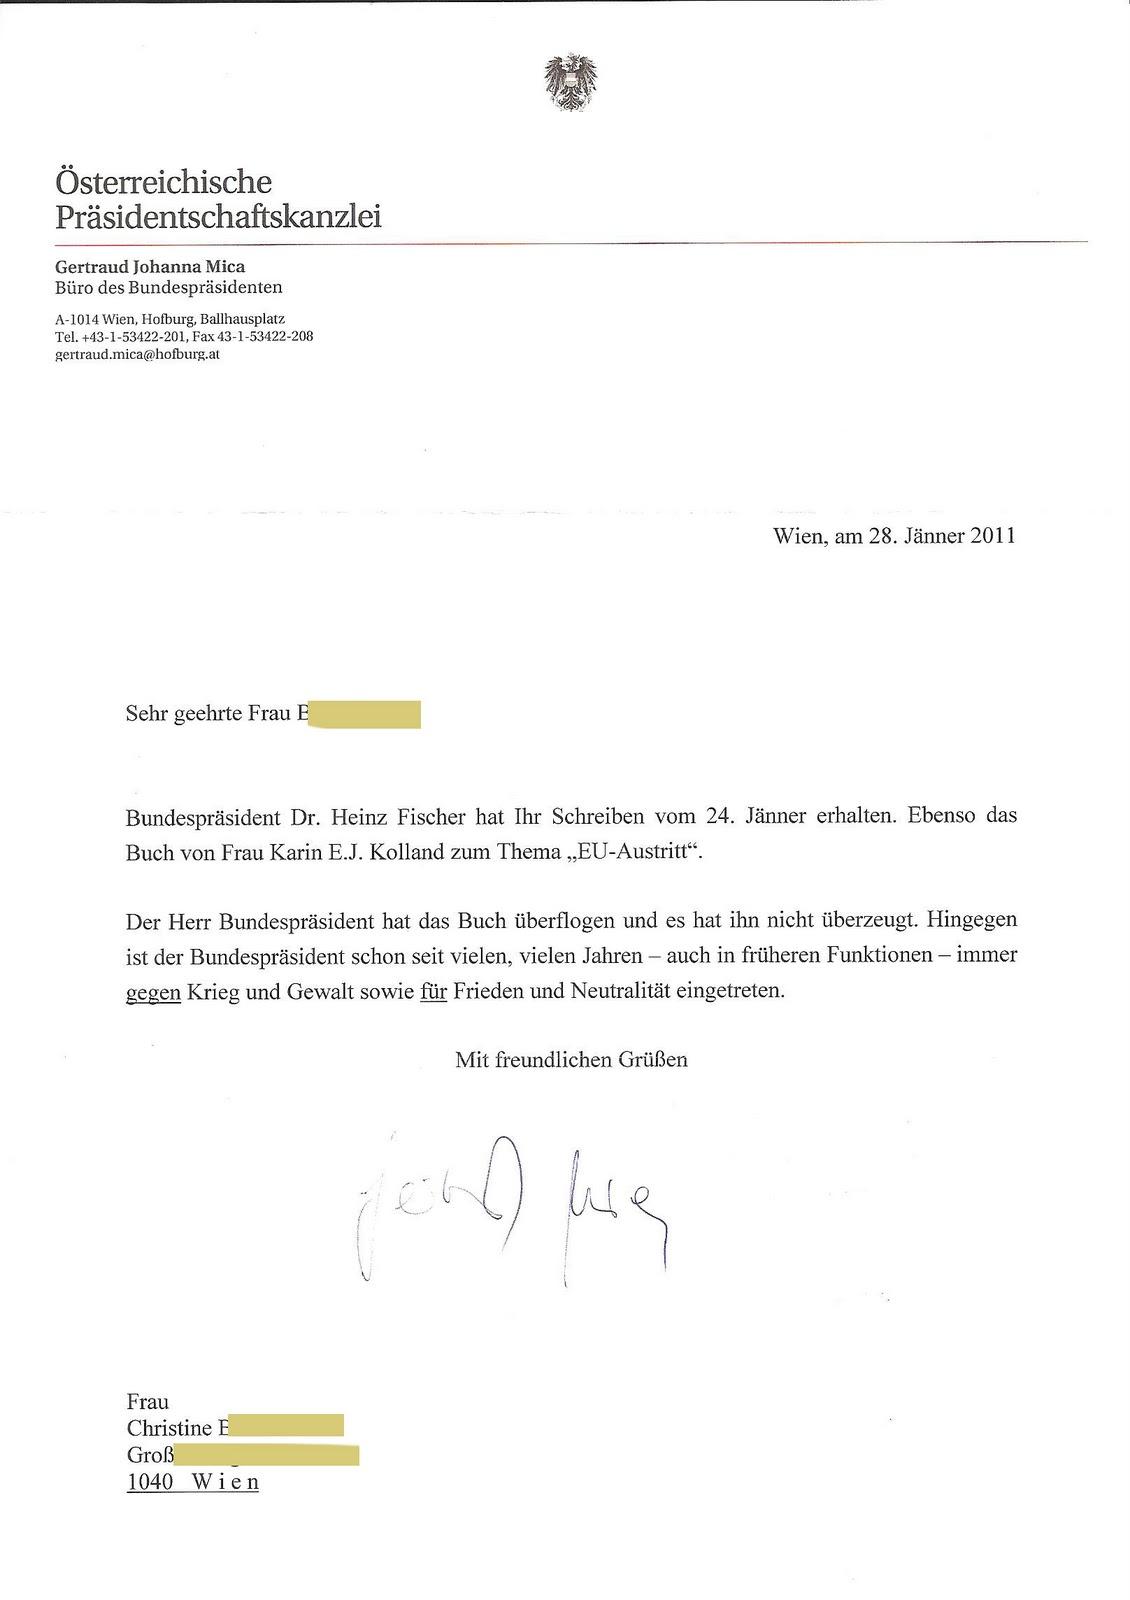 Karin E. J. Kolland Freiheit-Friede-Selbstbestimmtheit: Bundespräsidentschaftskanzlei ...